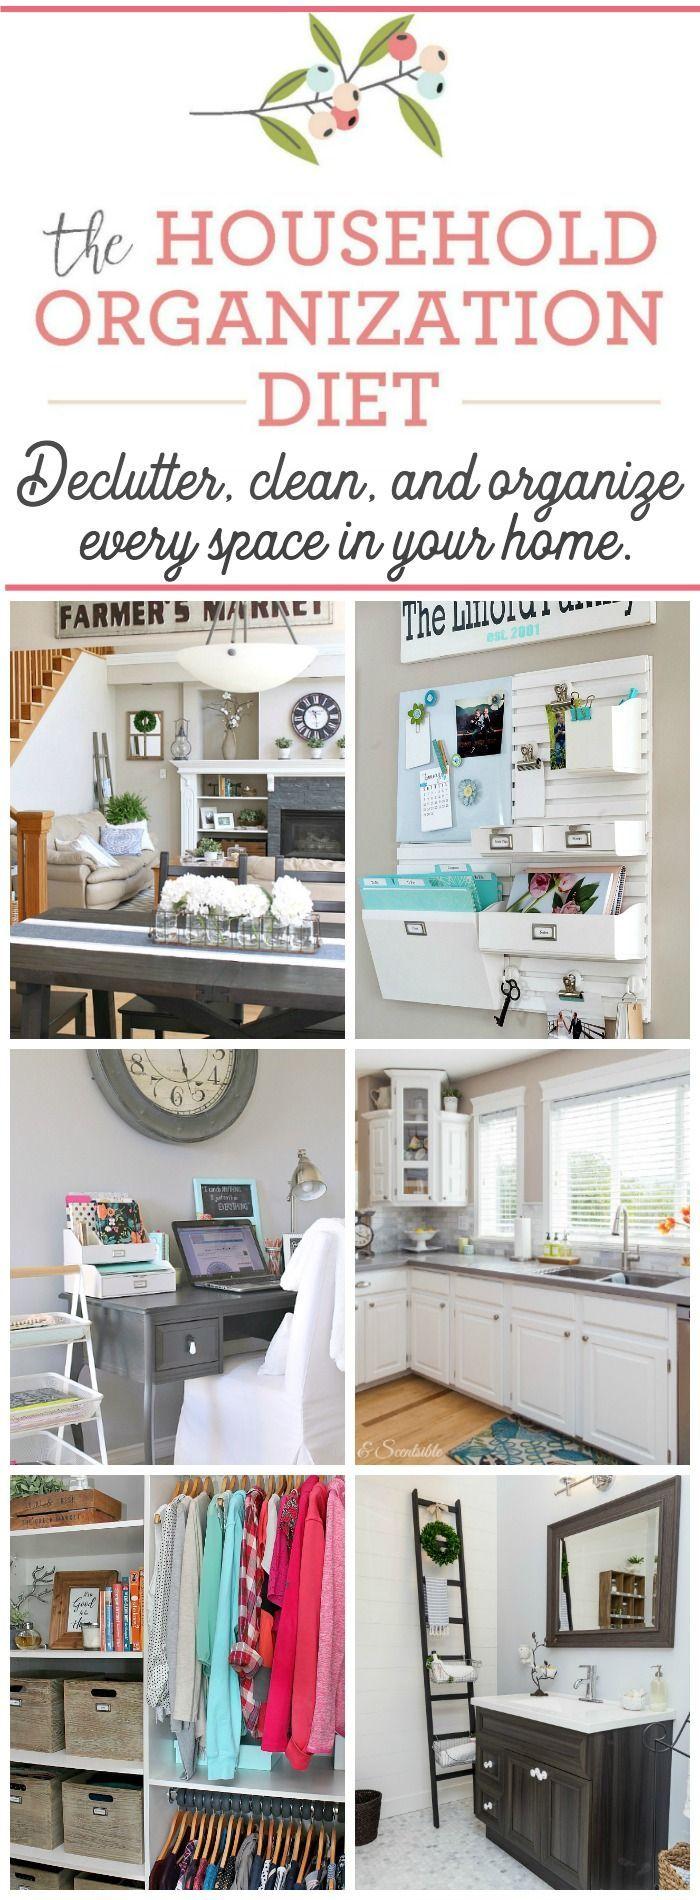 522 best Home // Organization images on Pinterest | Organization ...